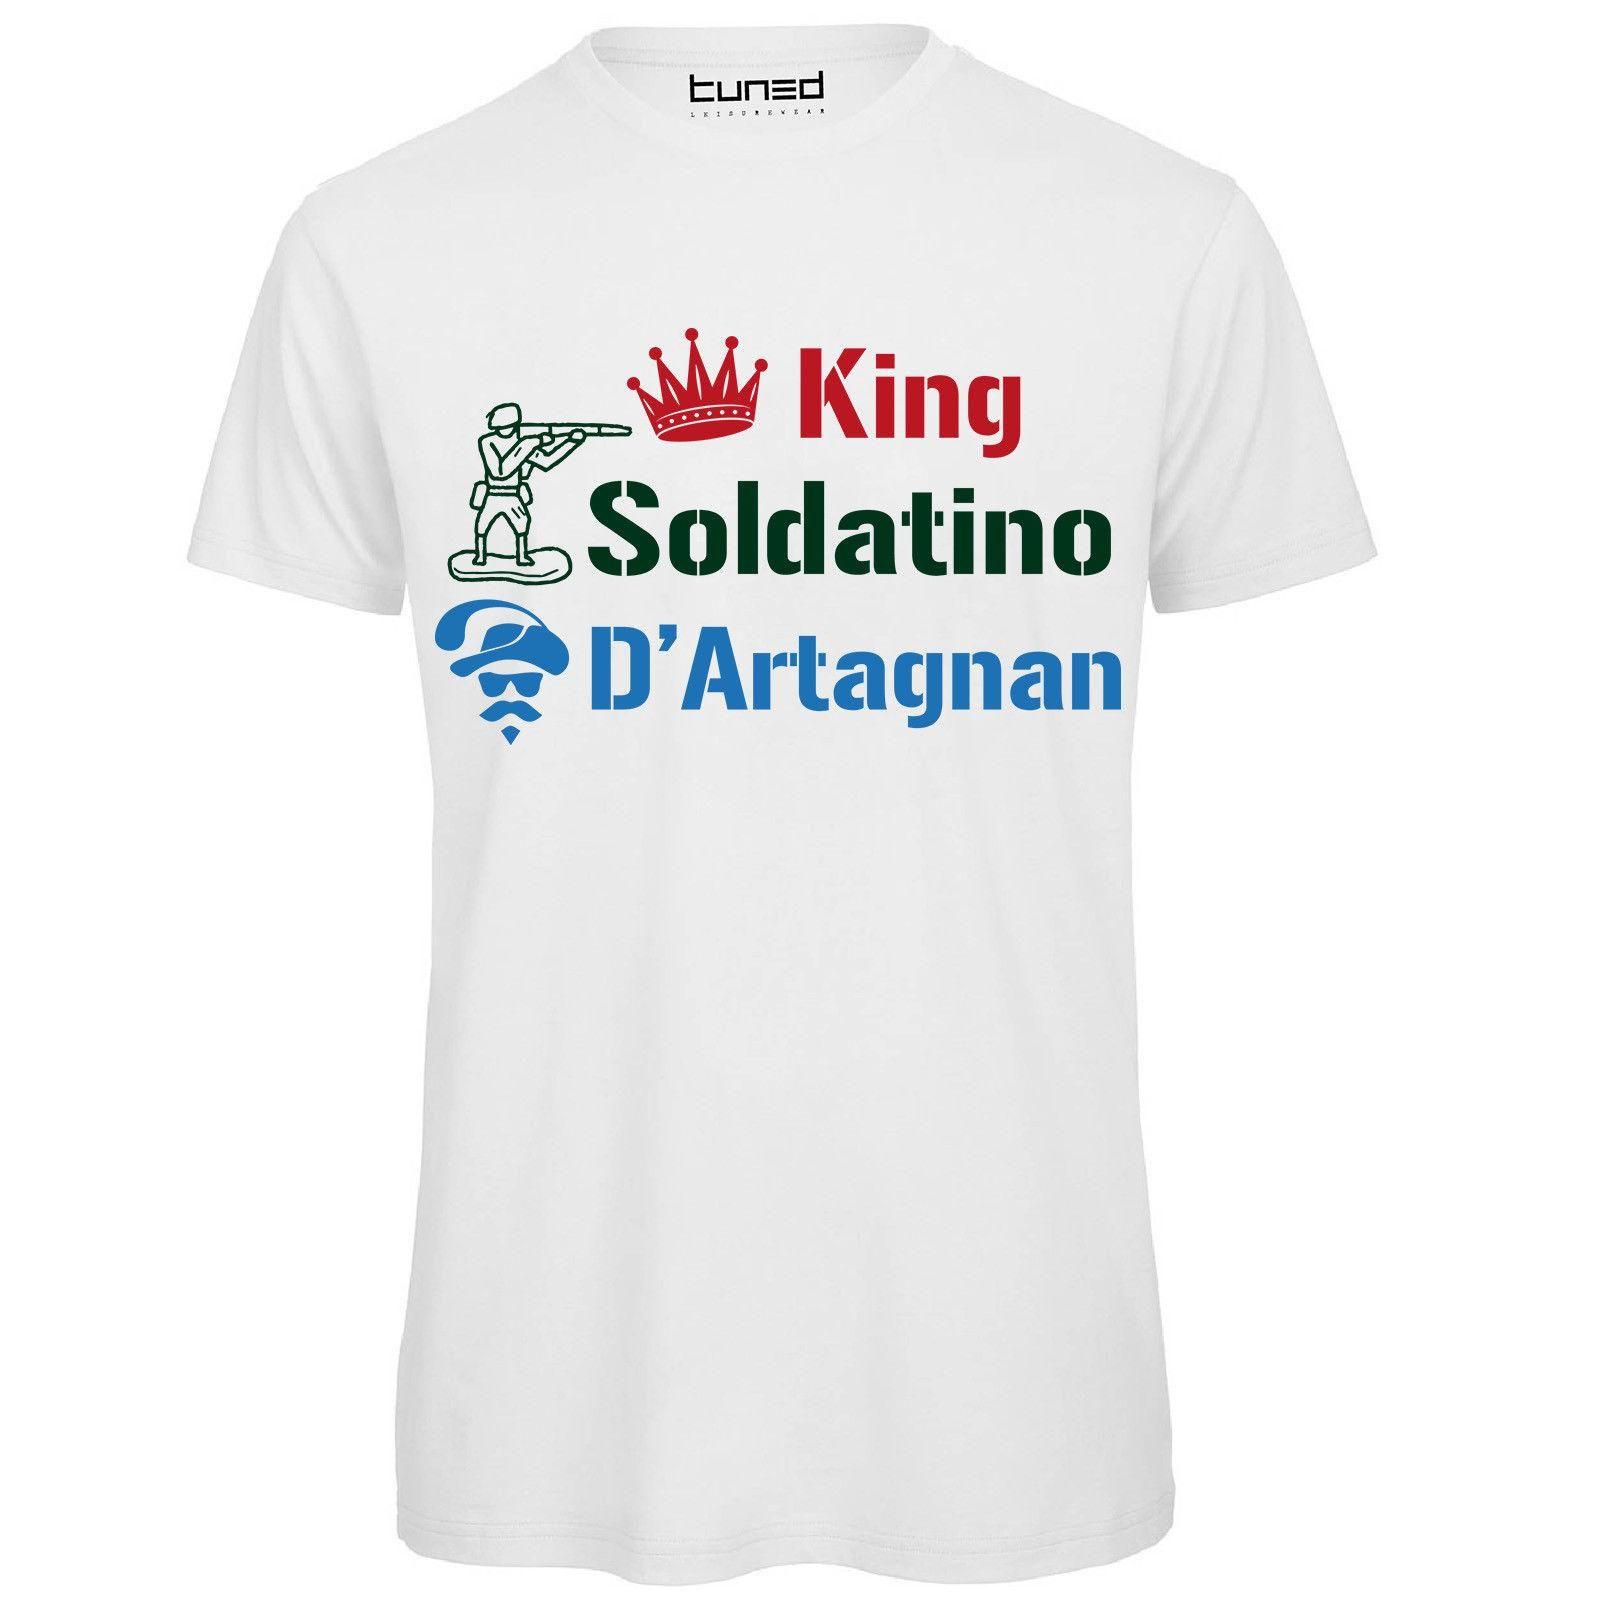 Футболка Ironica Uomo Maglia Con Stampa Citazioni Film Soldatino King Dartagnan Топы Мужской футболки